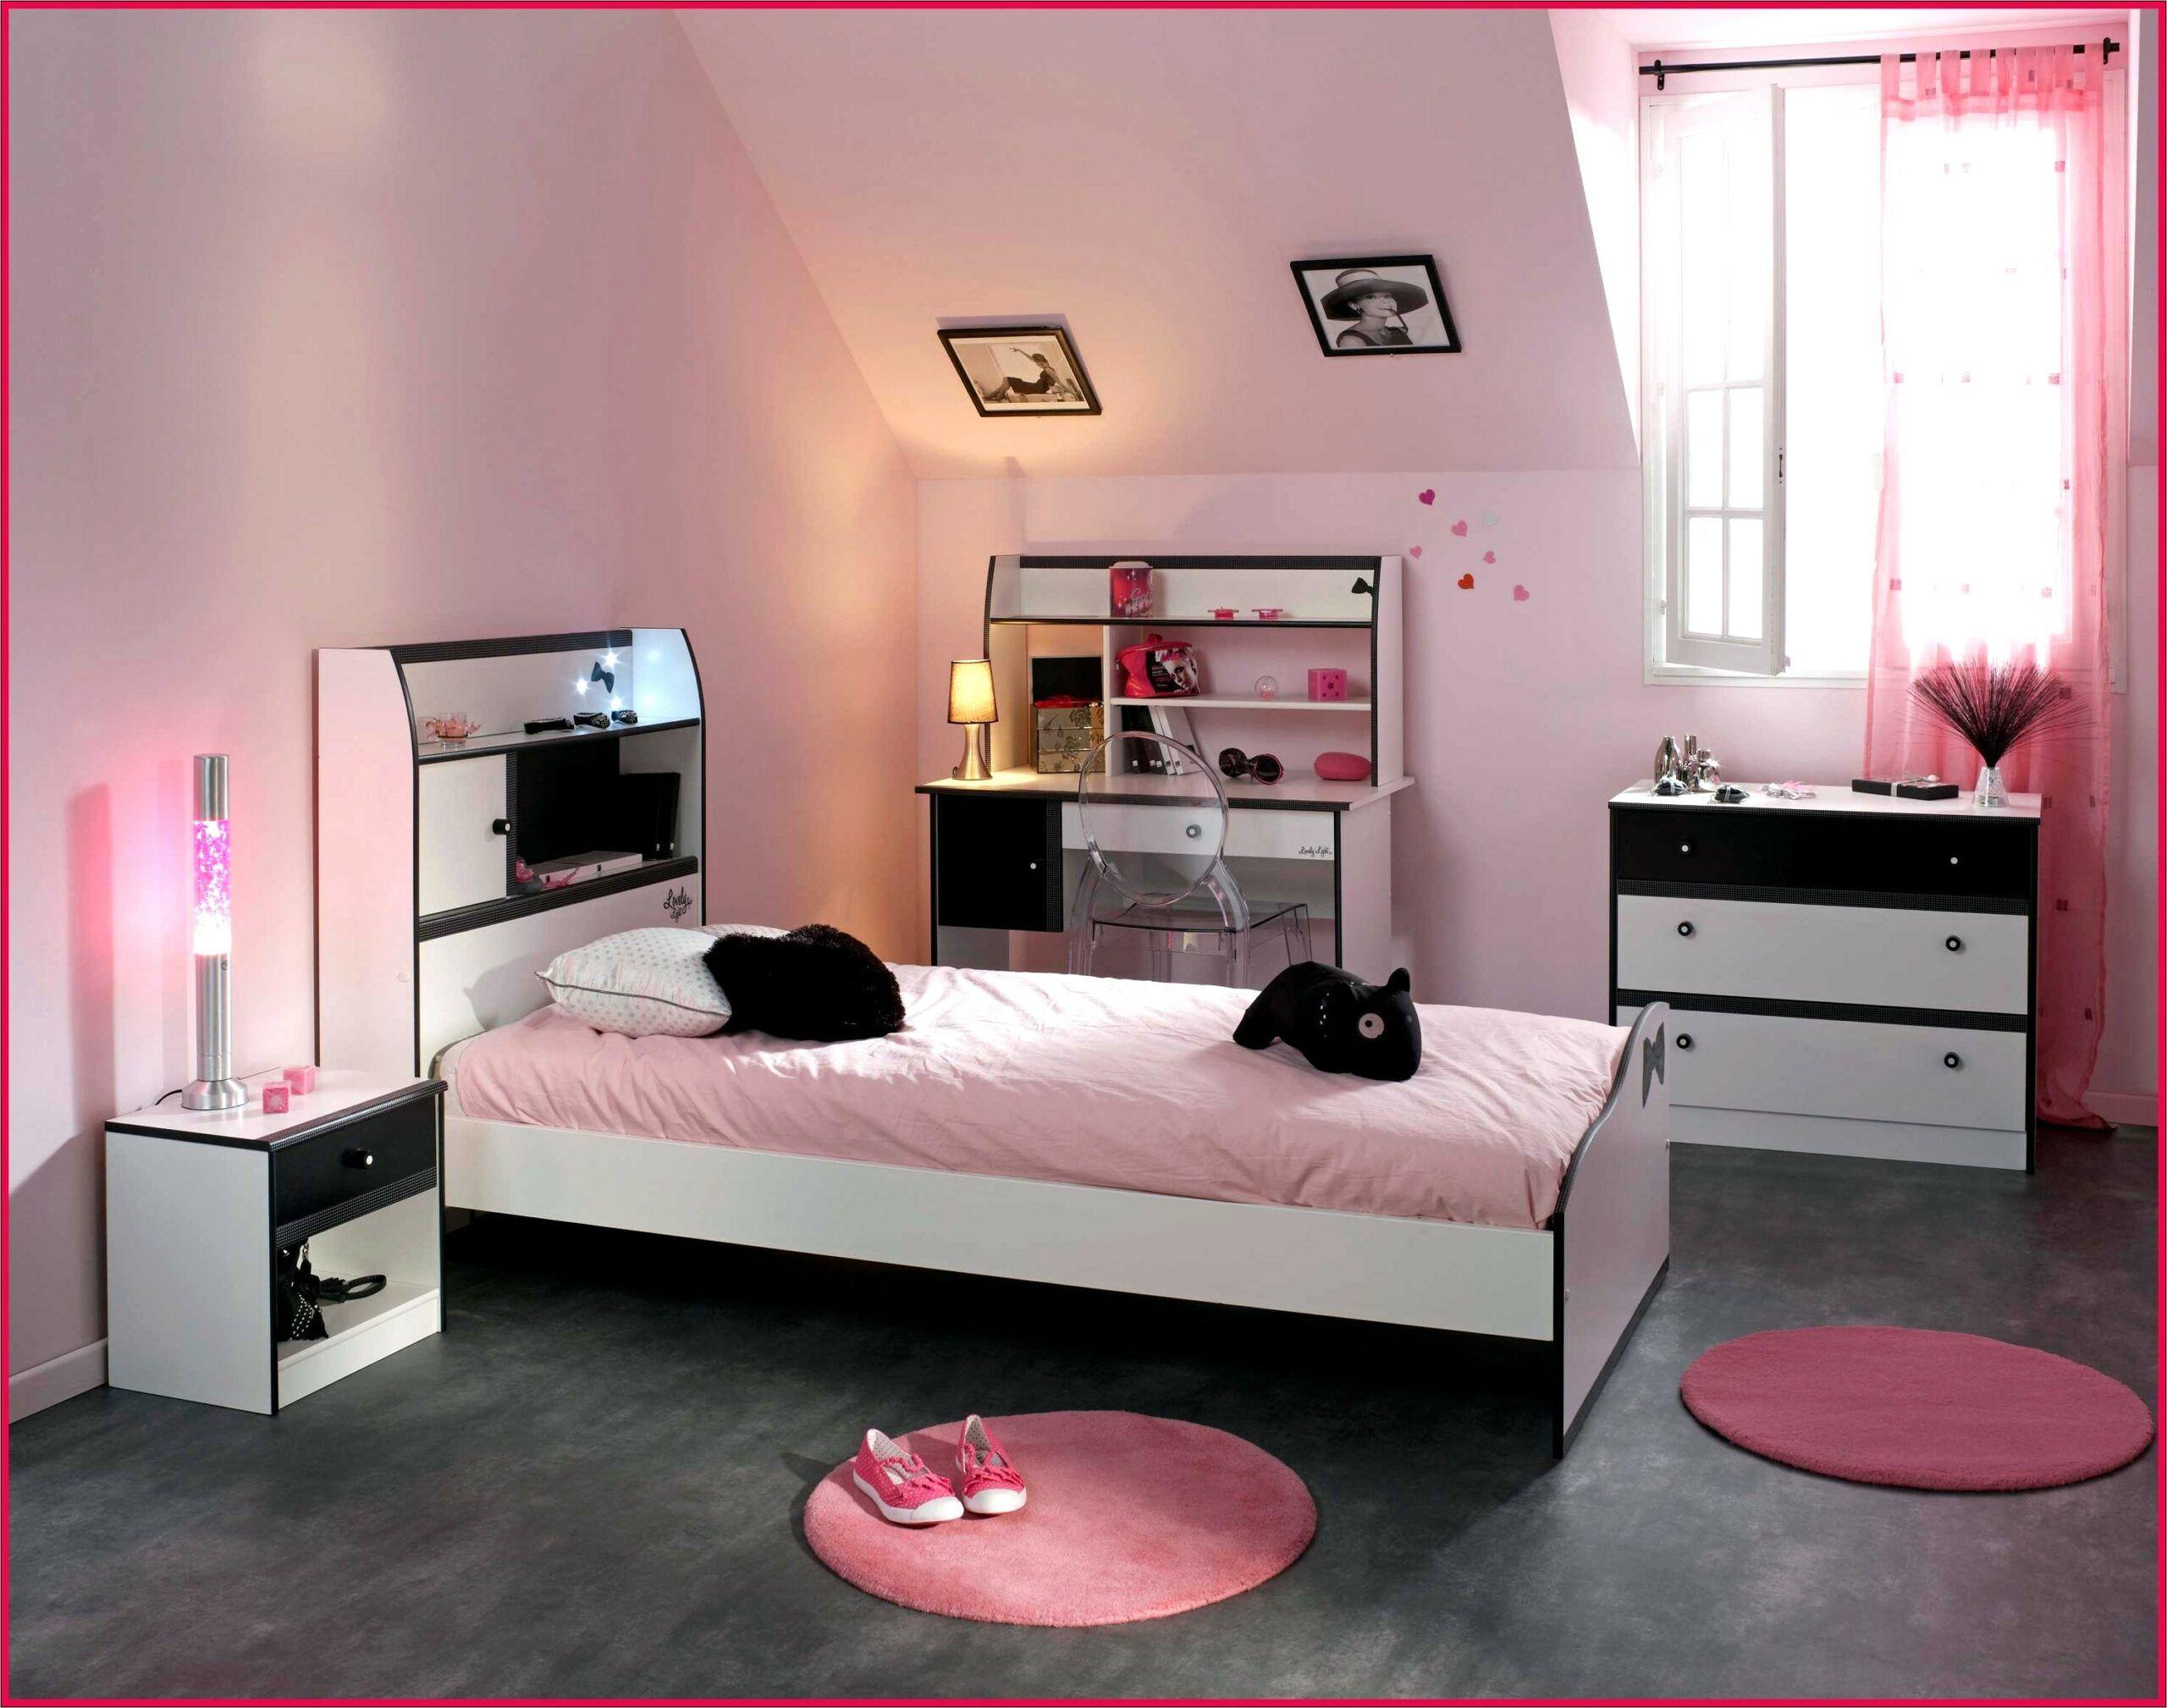 Deco Chambre Ado Moderne Ikea Teenager Bedroom Design Modern Bedroom Small Bedroom Decor